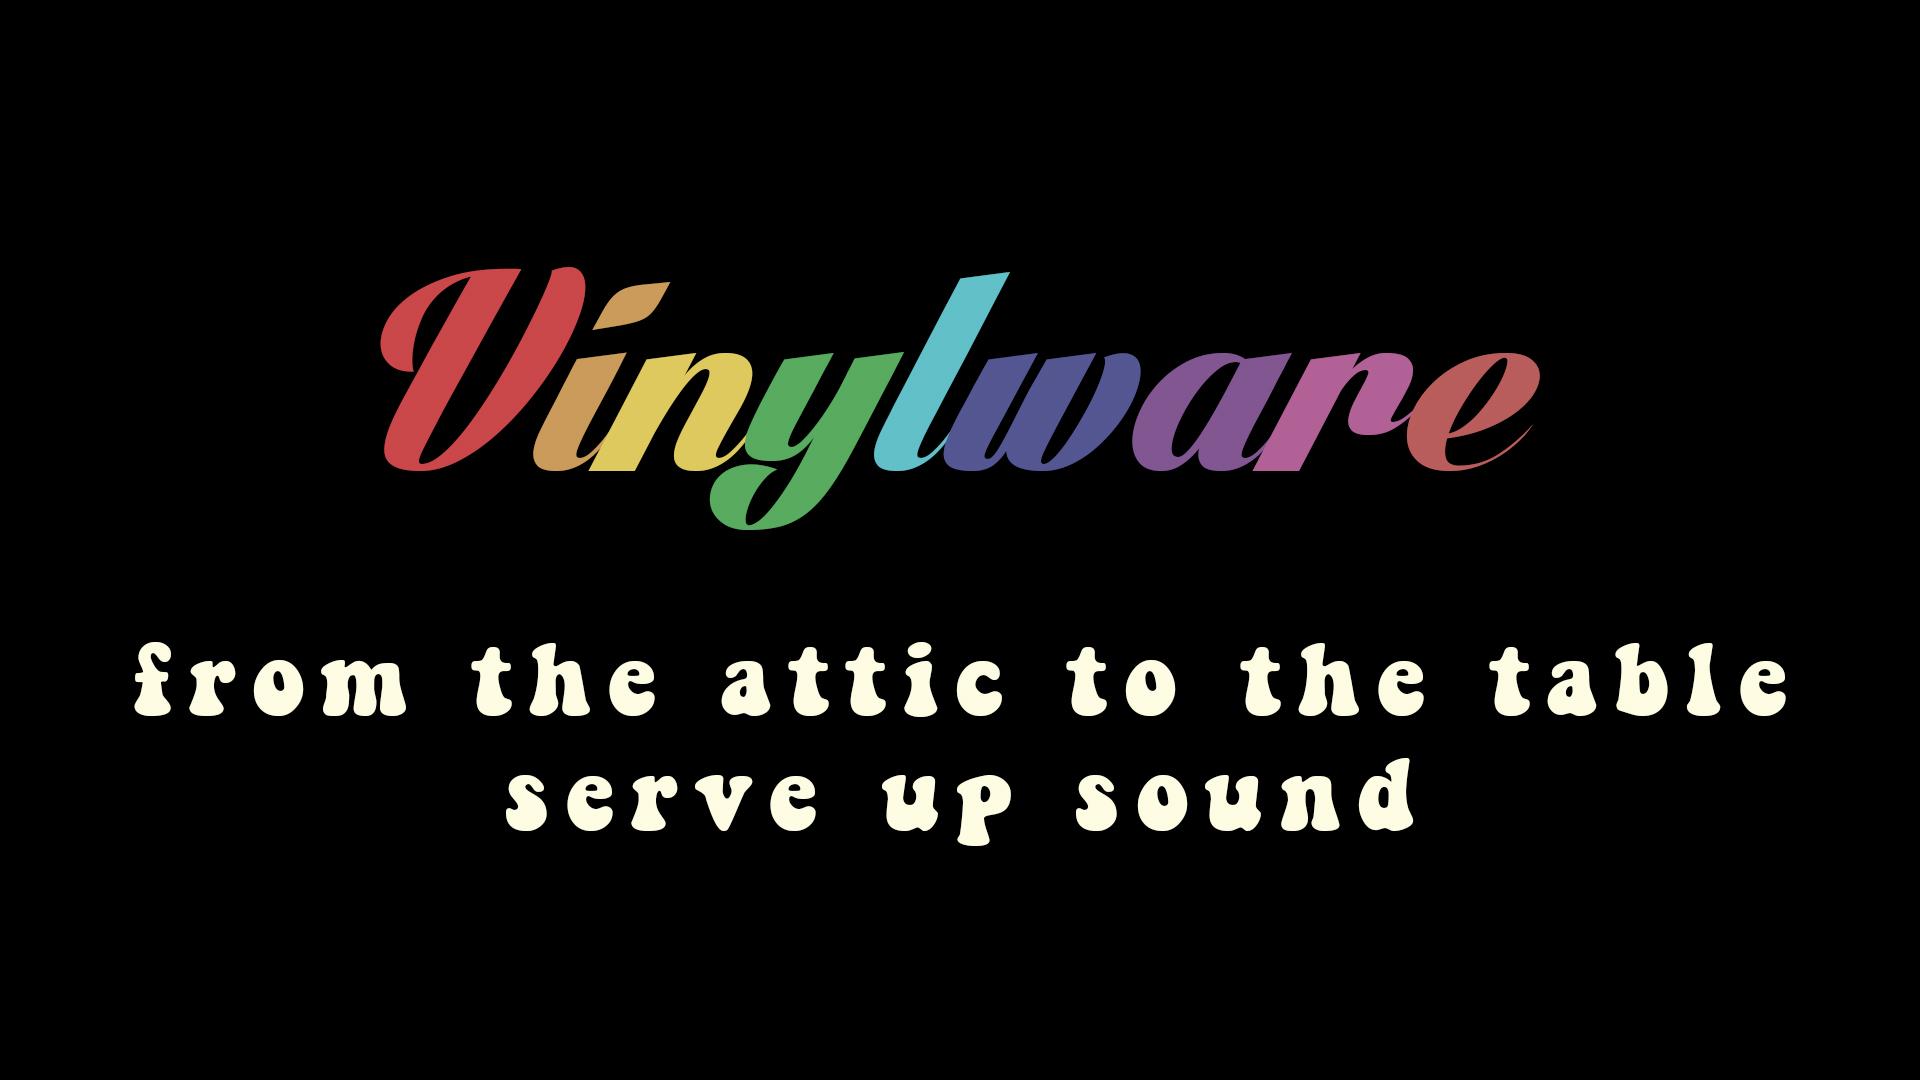 Vinylware